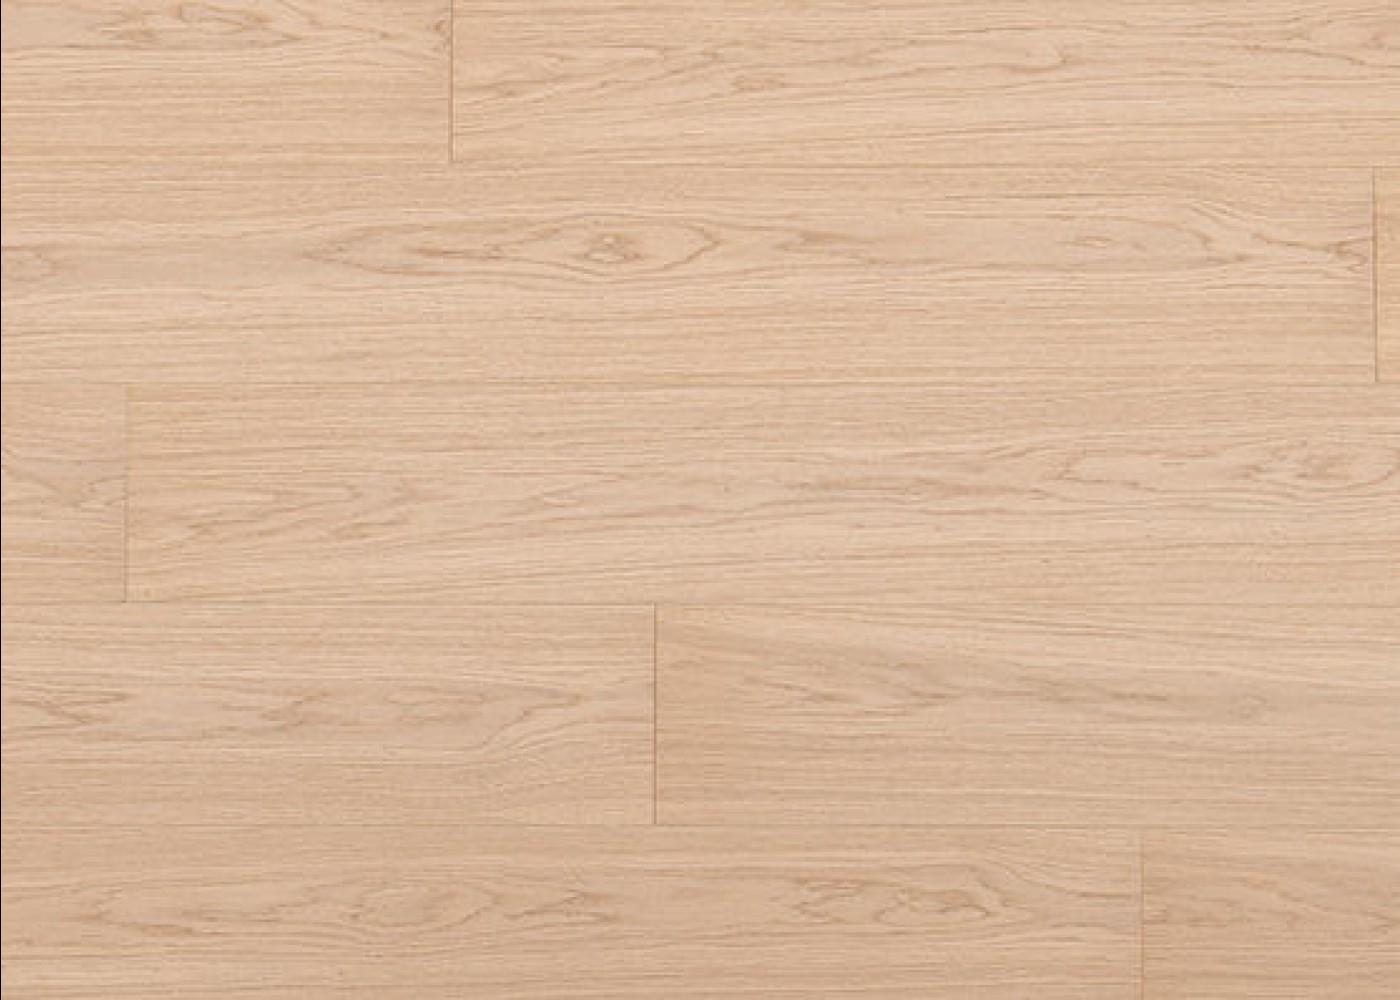 Sol plaqué bois Chêne LUCERA brossé vernis extra-mat - Summit - Select 10x233x2050